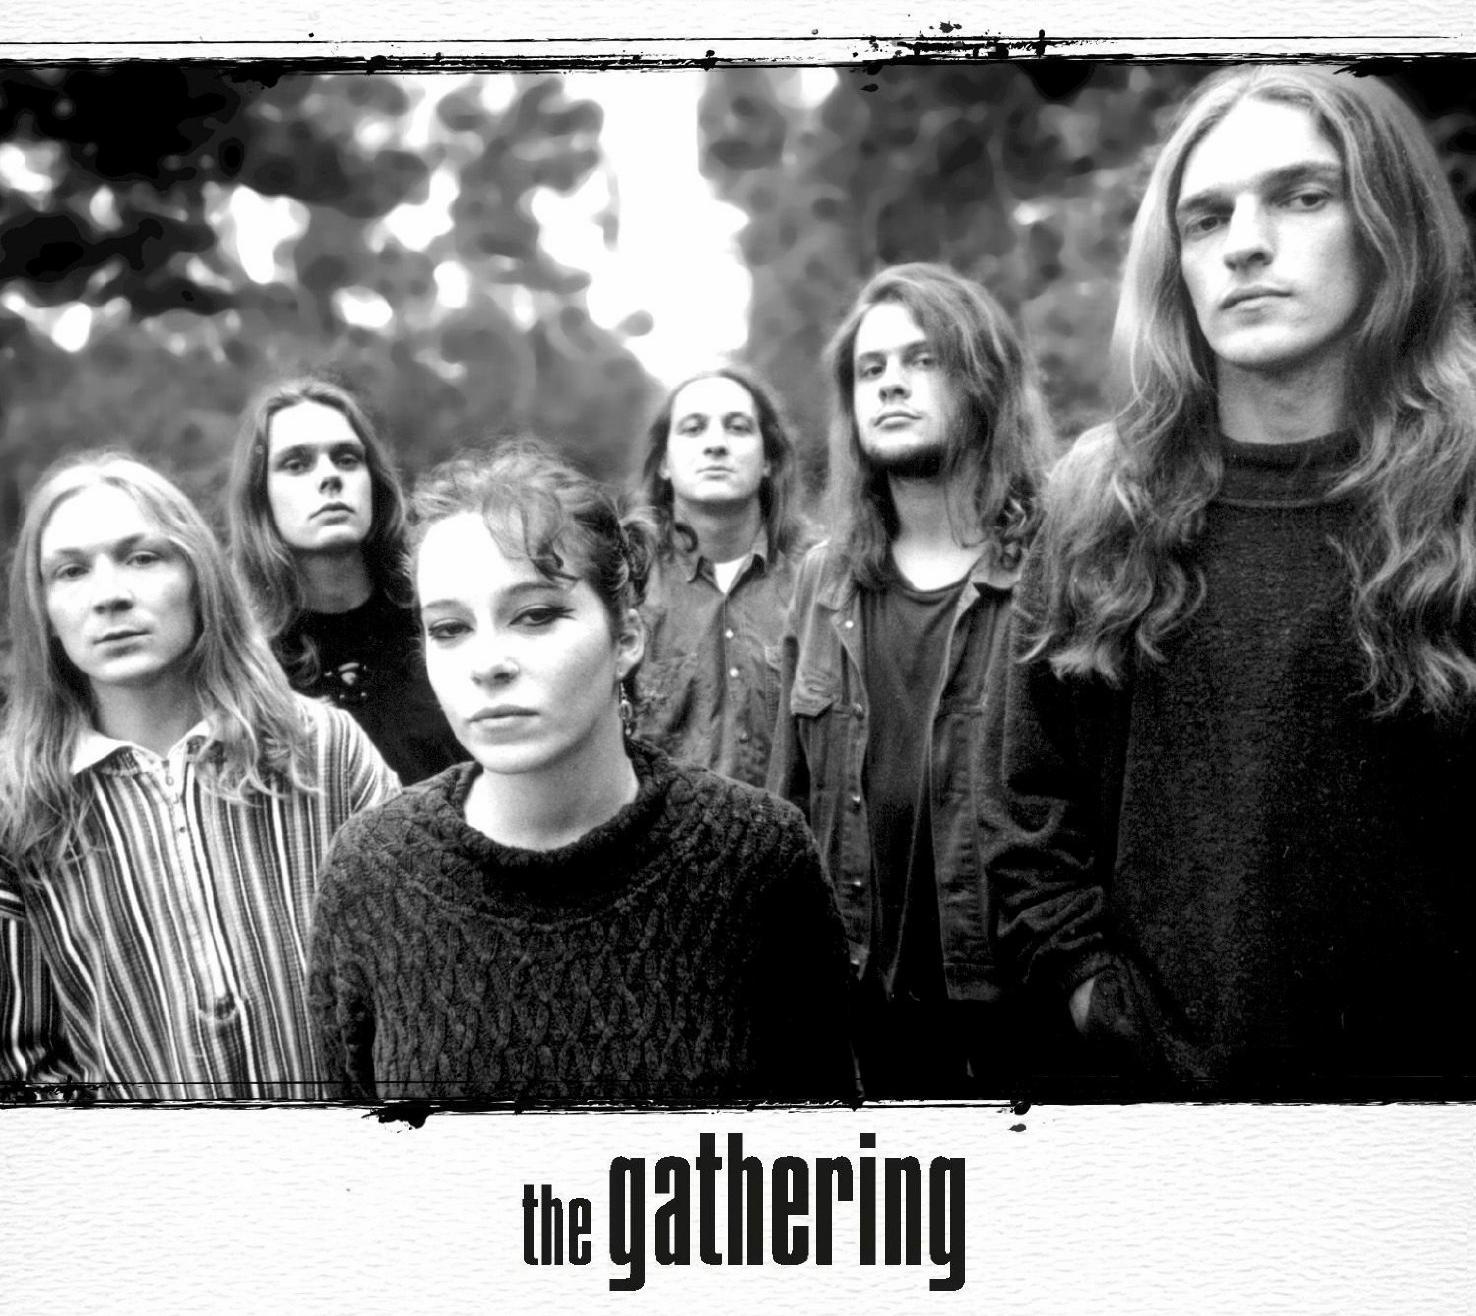 the_gathering_original_album_collection.jpg